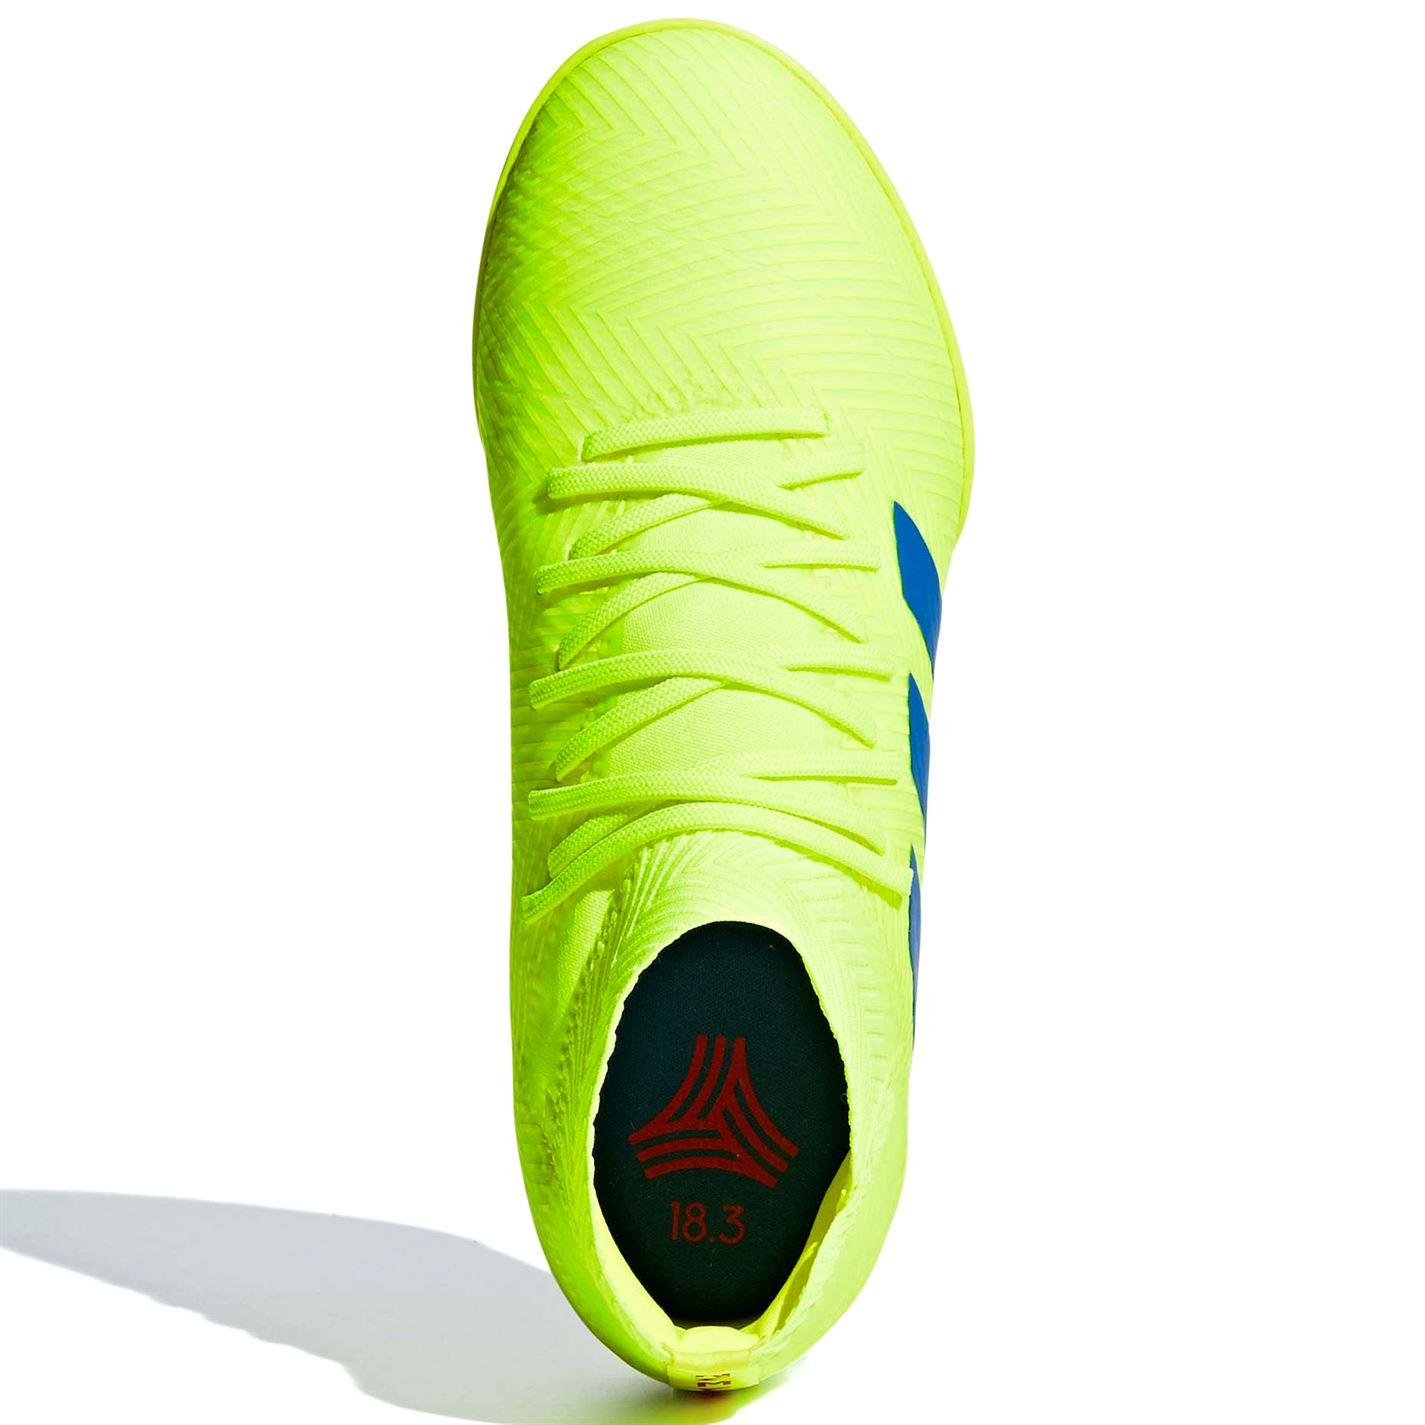 new concept 20d3d beaa6 adidas-Kids-Nemeziz-Tango-18-3-Childs-Astro-